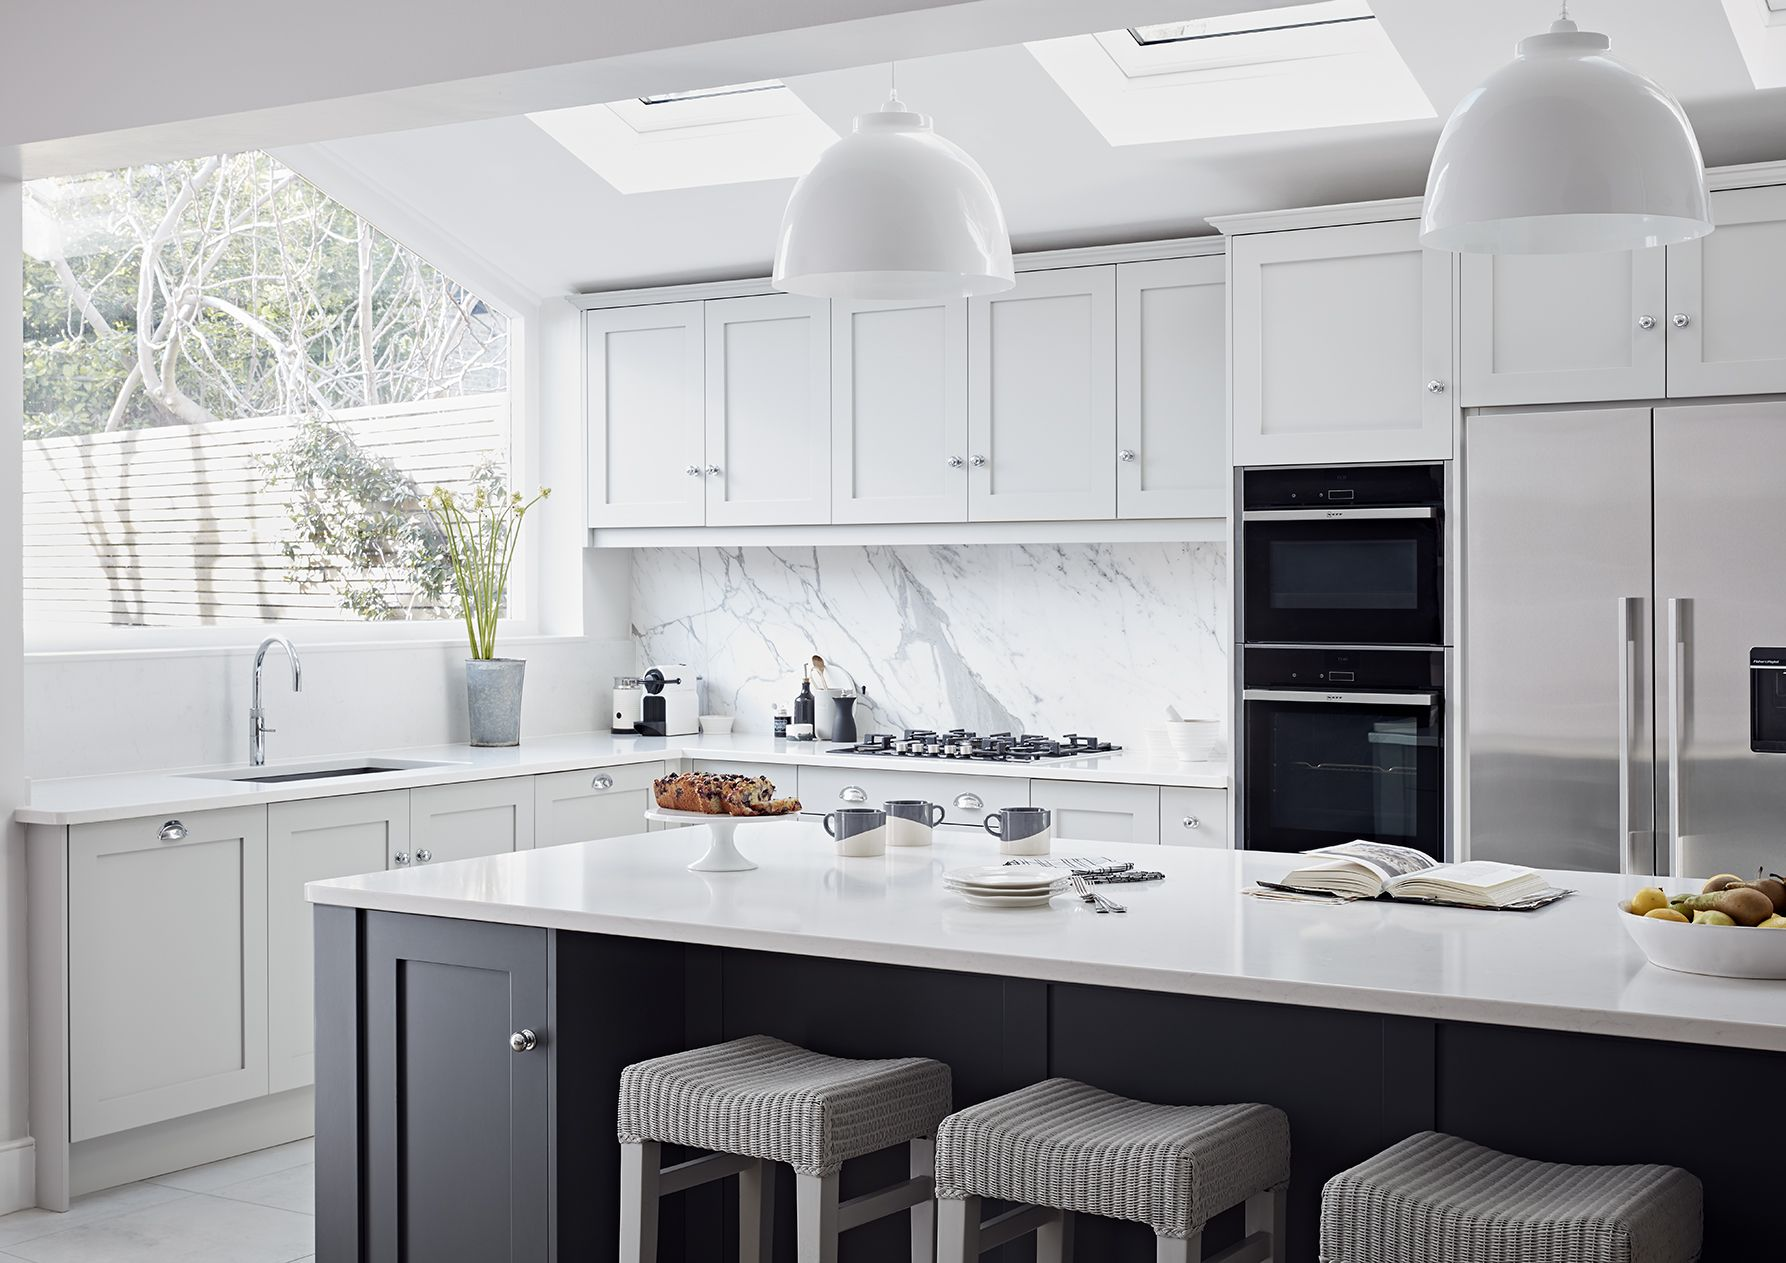 Best Shaker Kitchens Uk Kitchen Style Kitchen Design 400 x 300